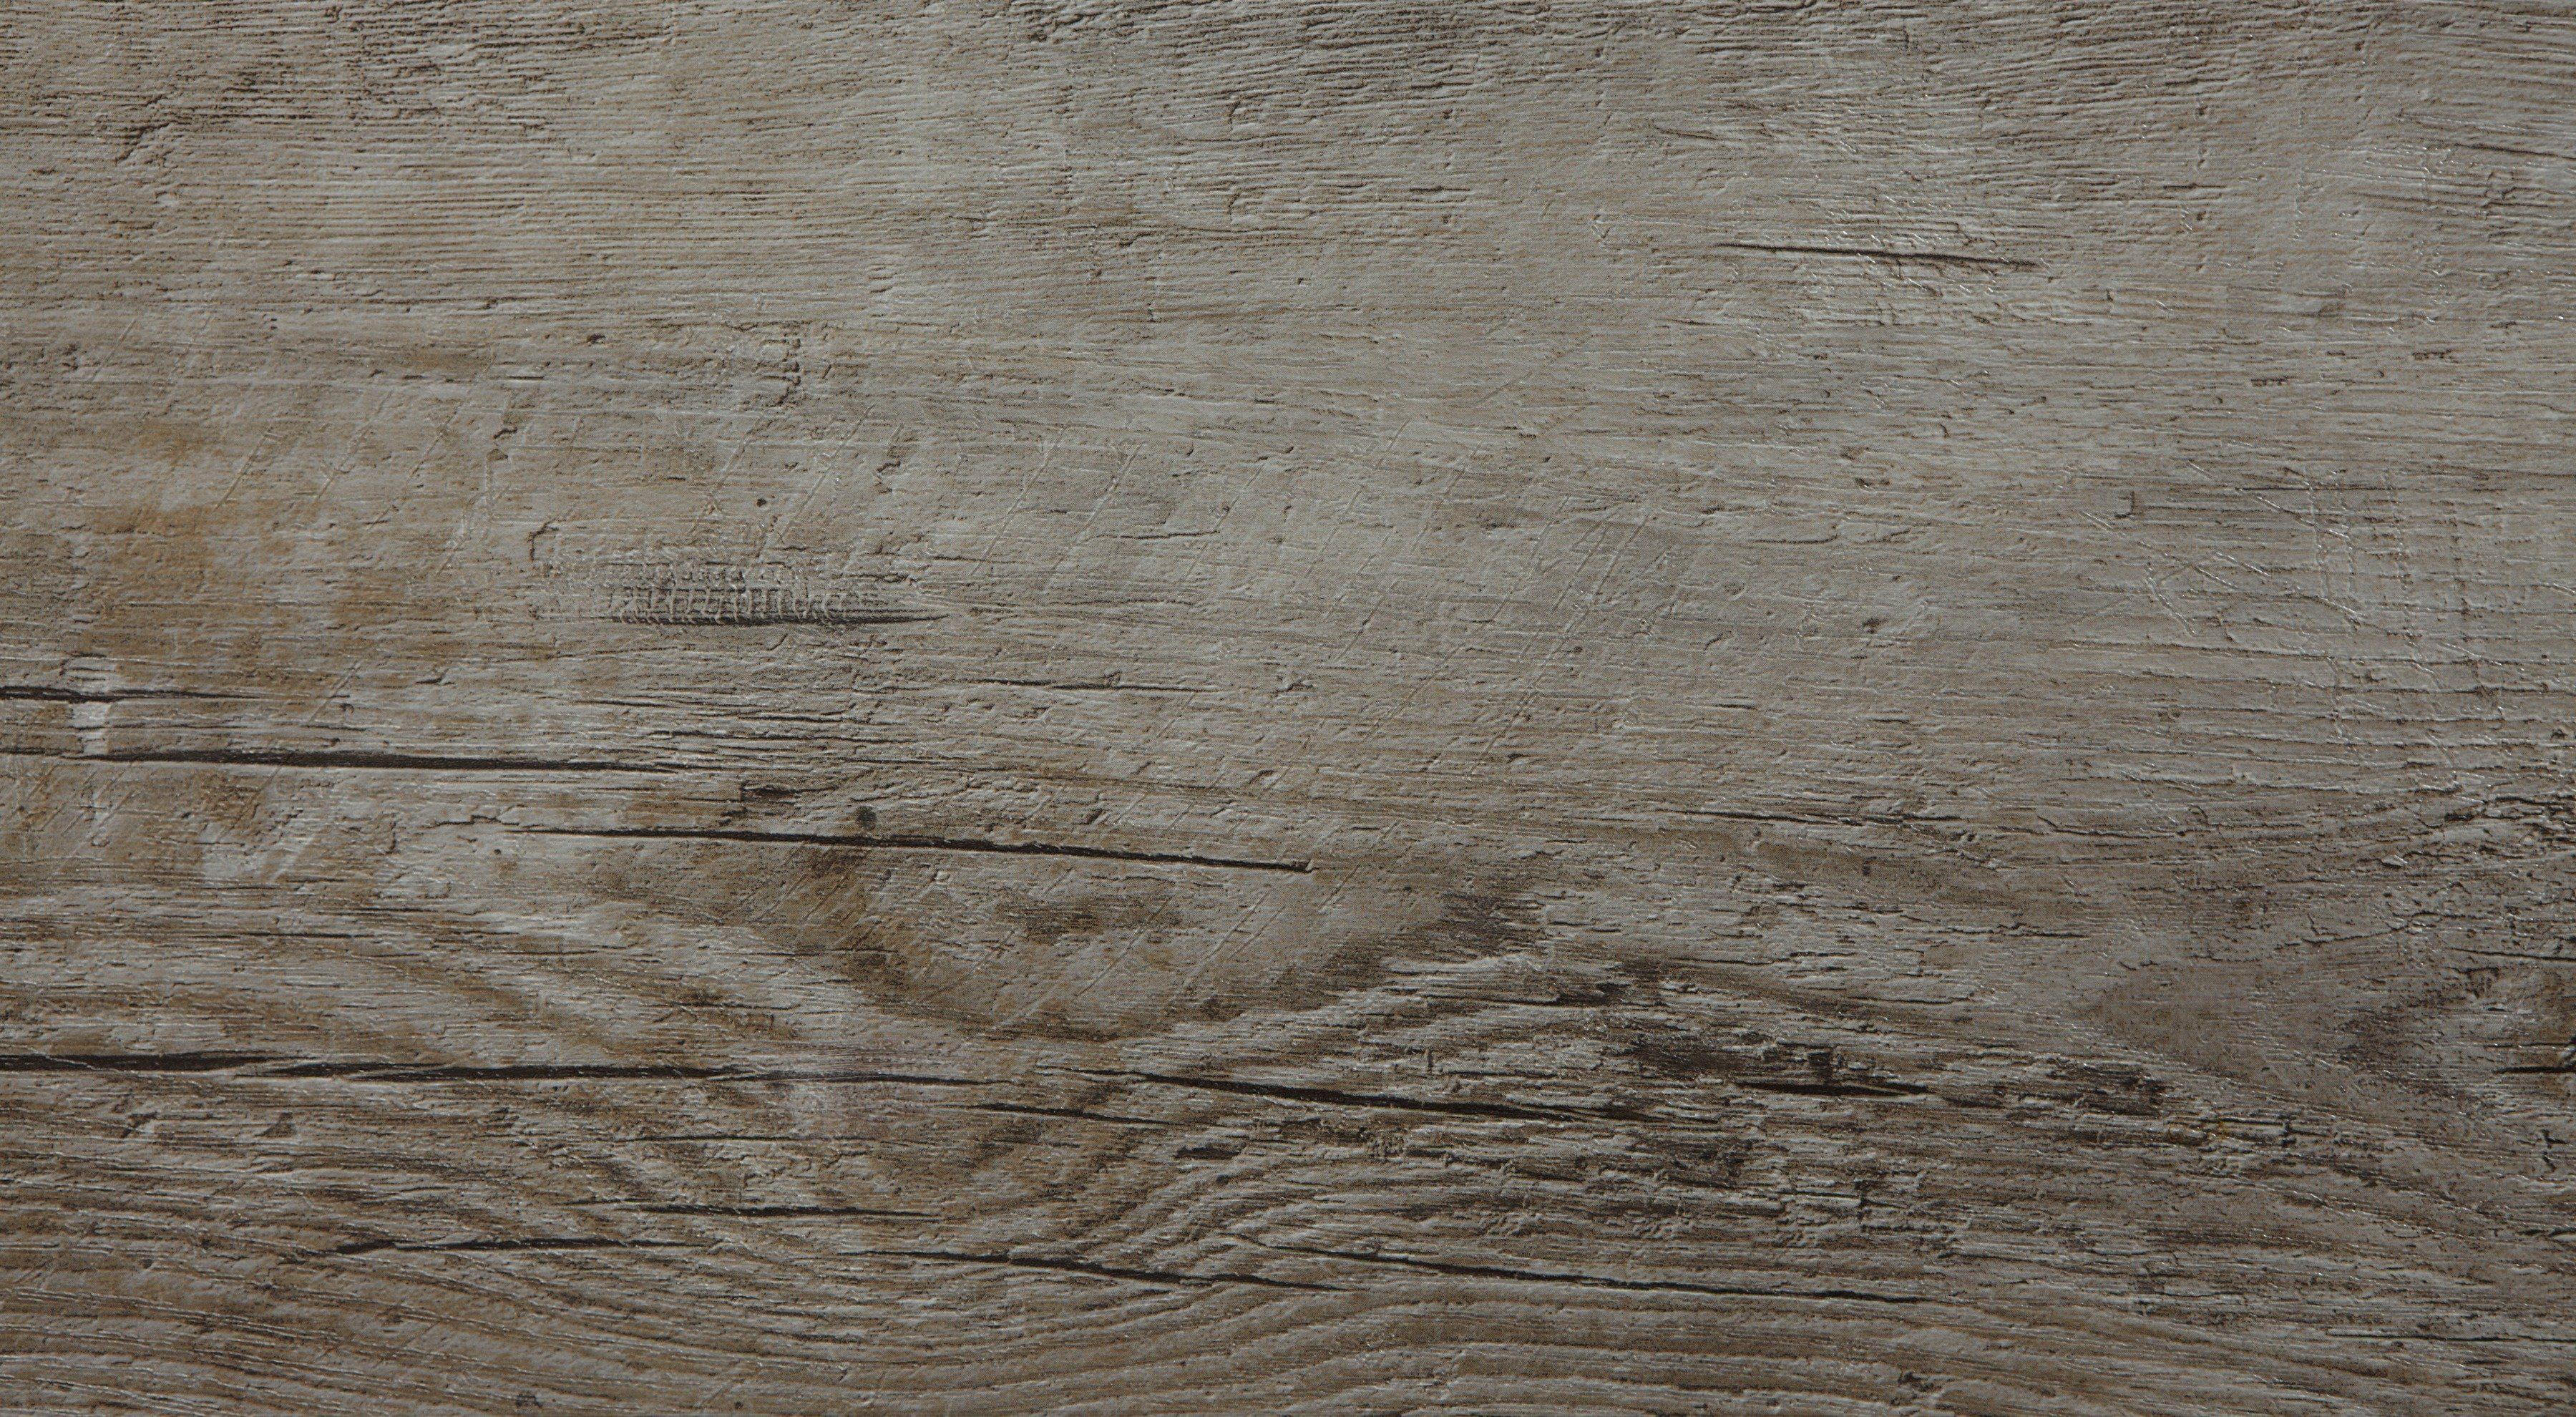 MODERNA Vinyllaminat »v-tec 30 - Arica Eiche«, 1220 x 180 mm